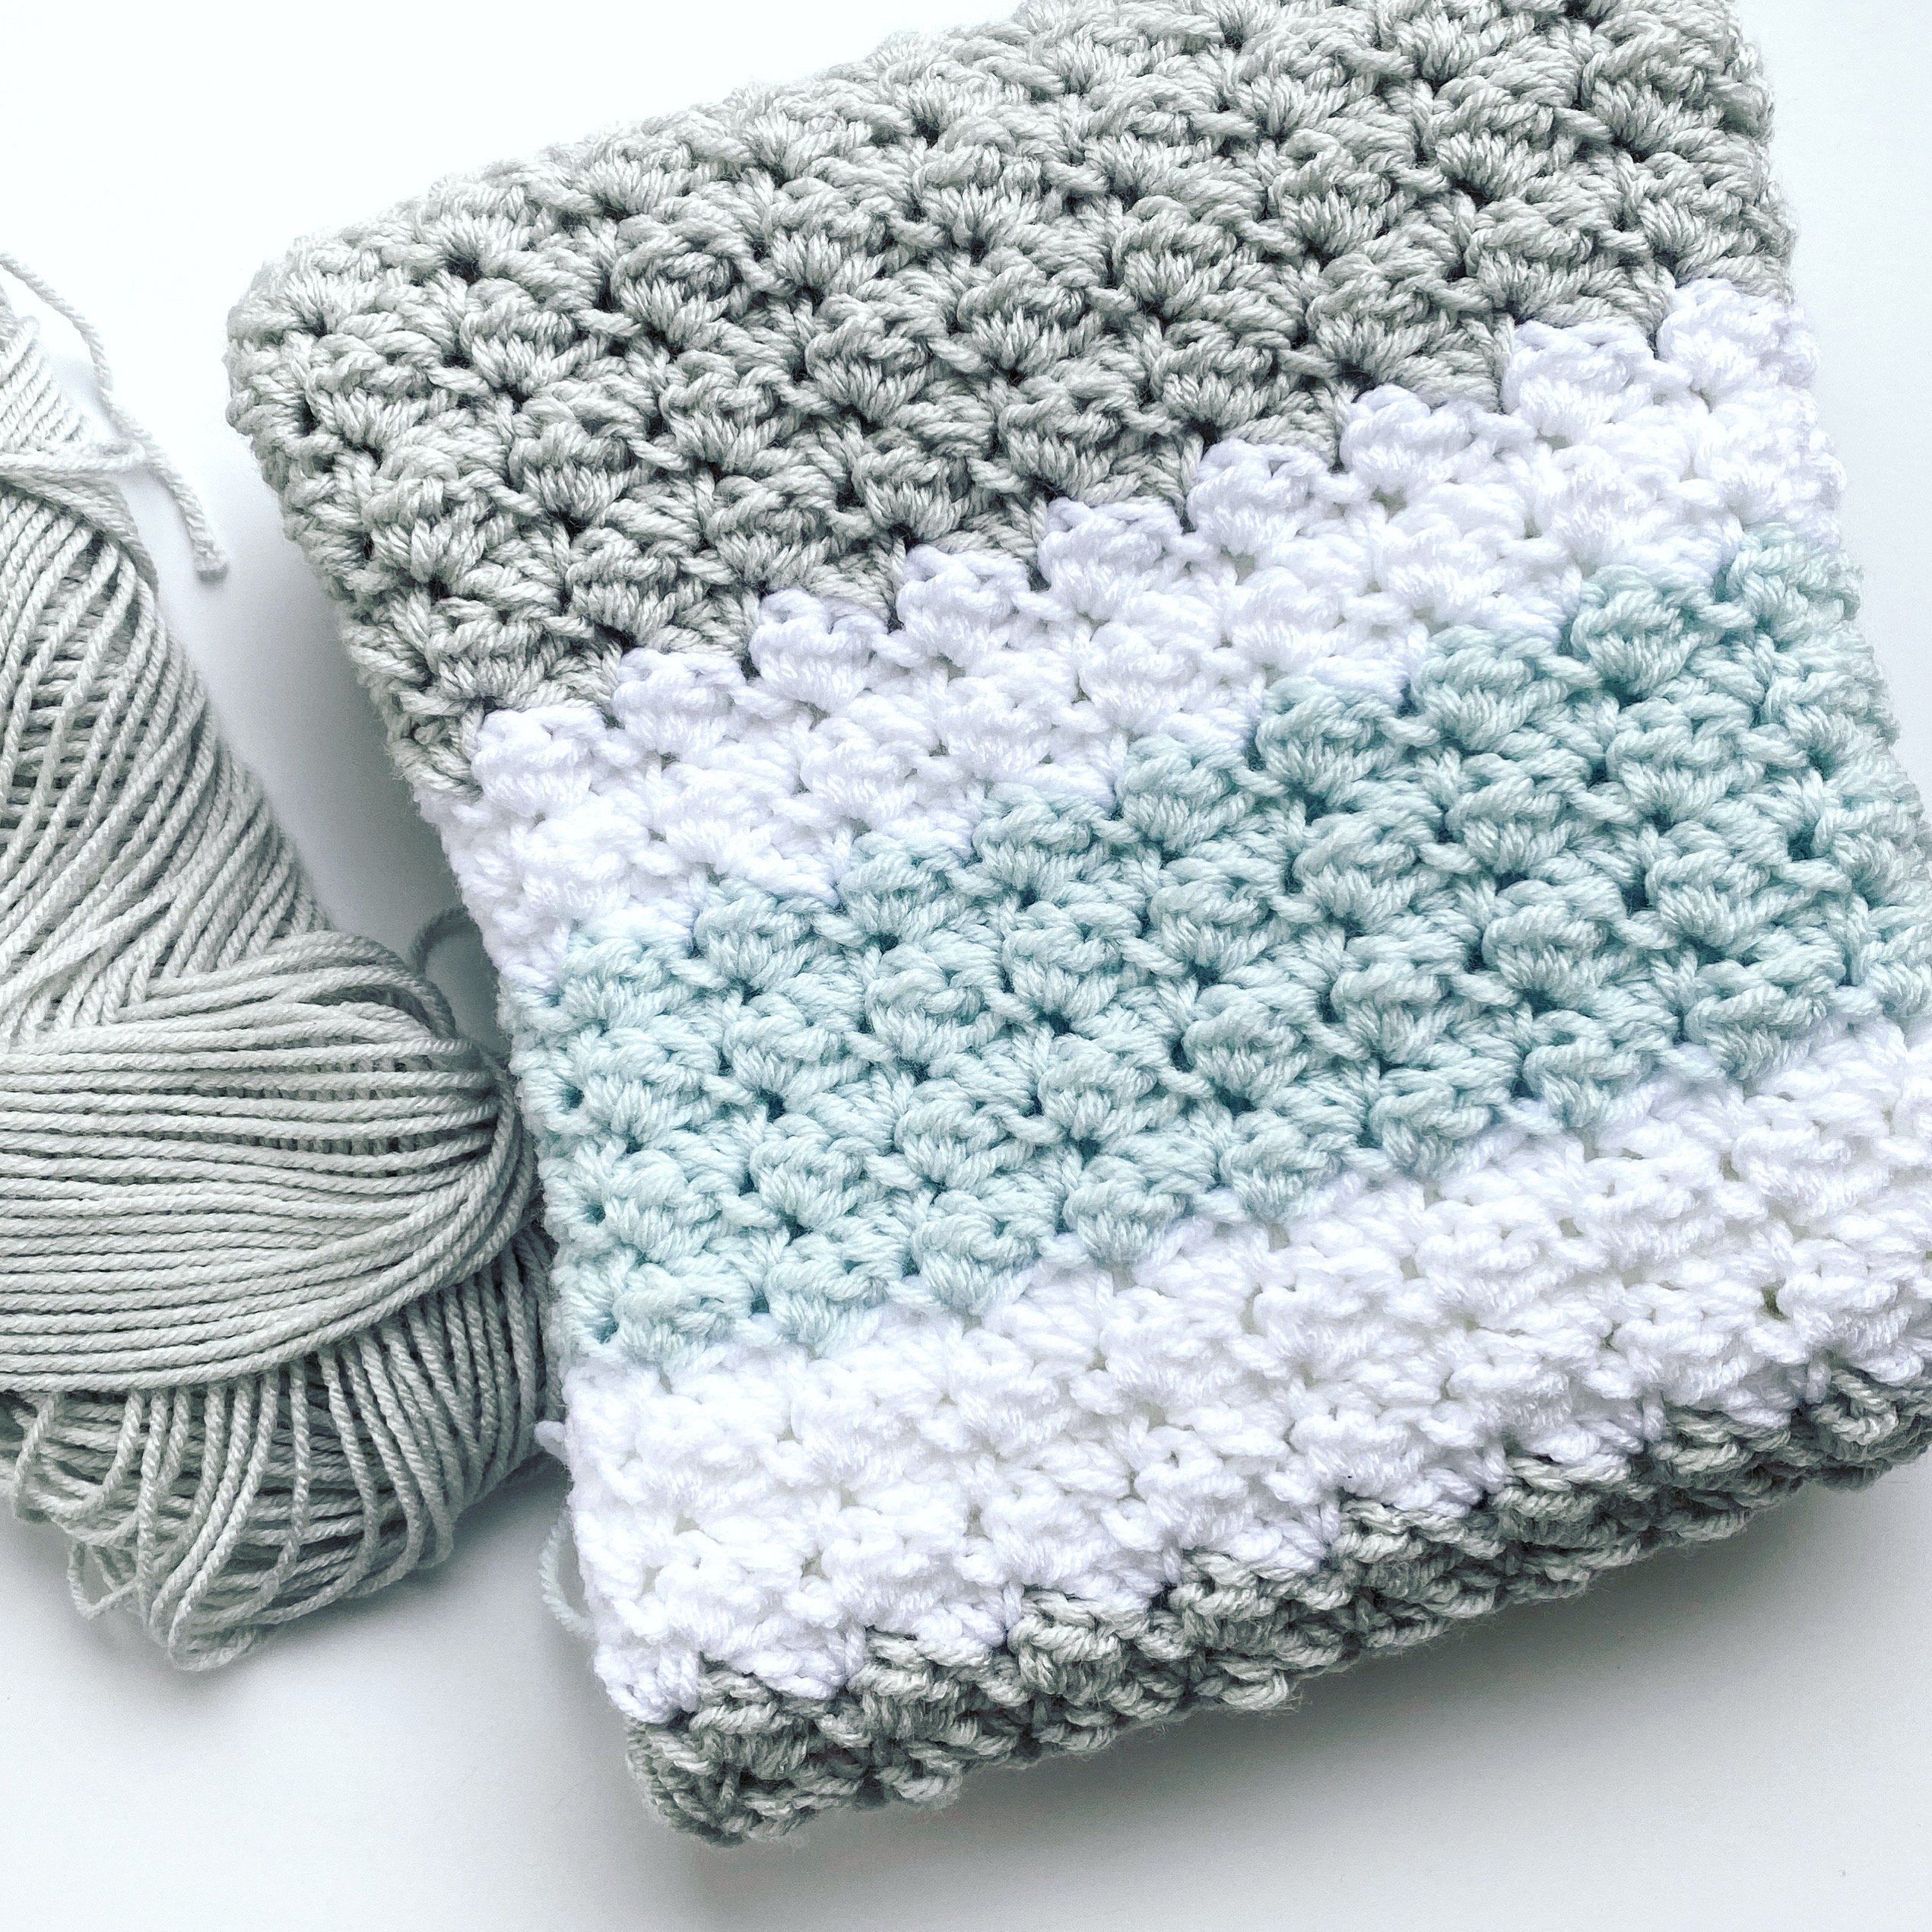 Green Handmade Crocheted Afghan Lap Throw Baby Blanket Corner to Corner Moss Gray